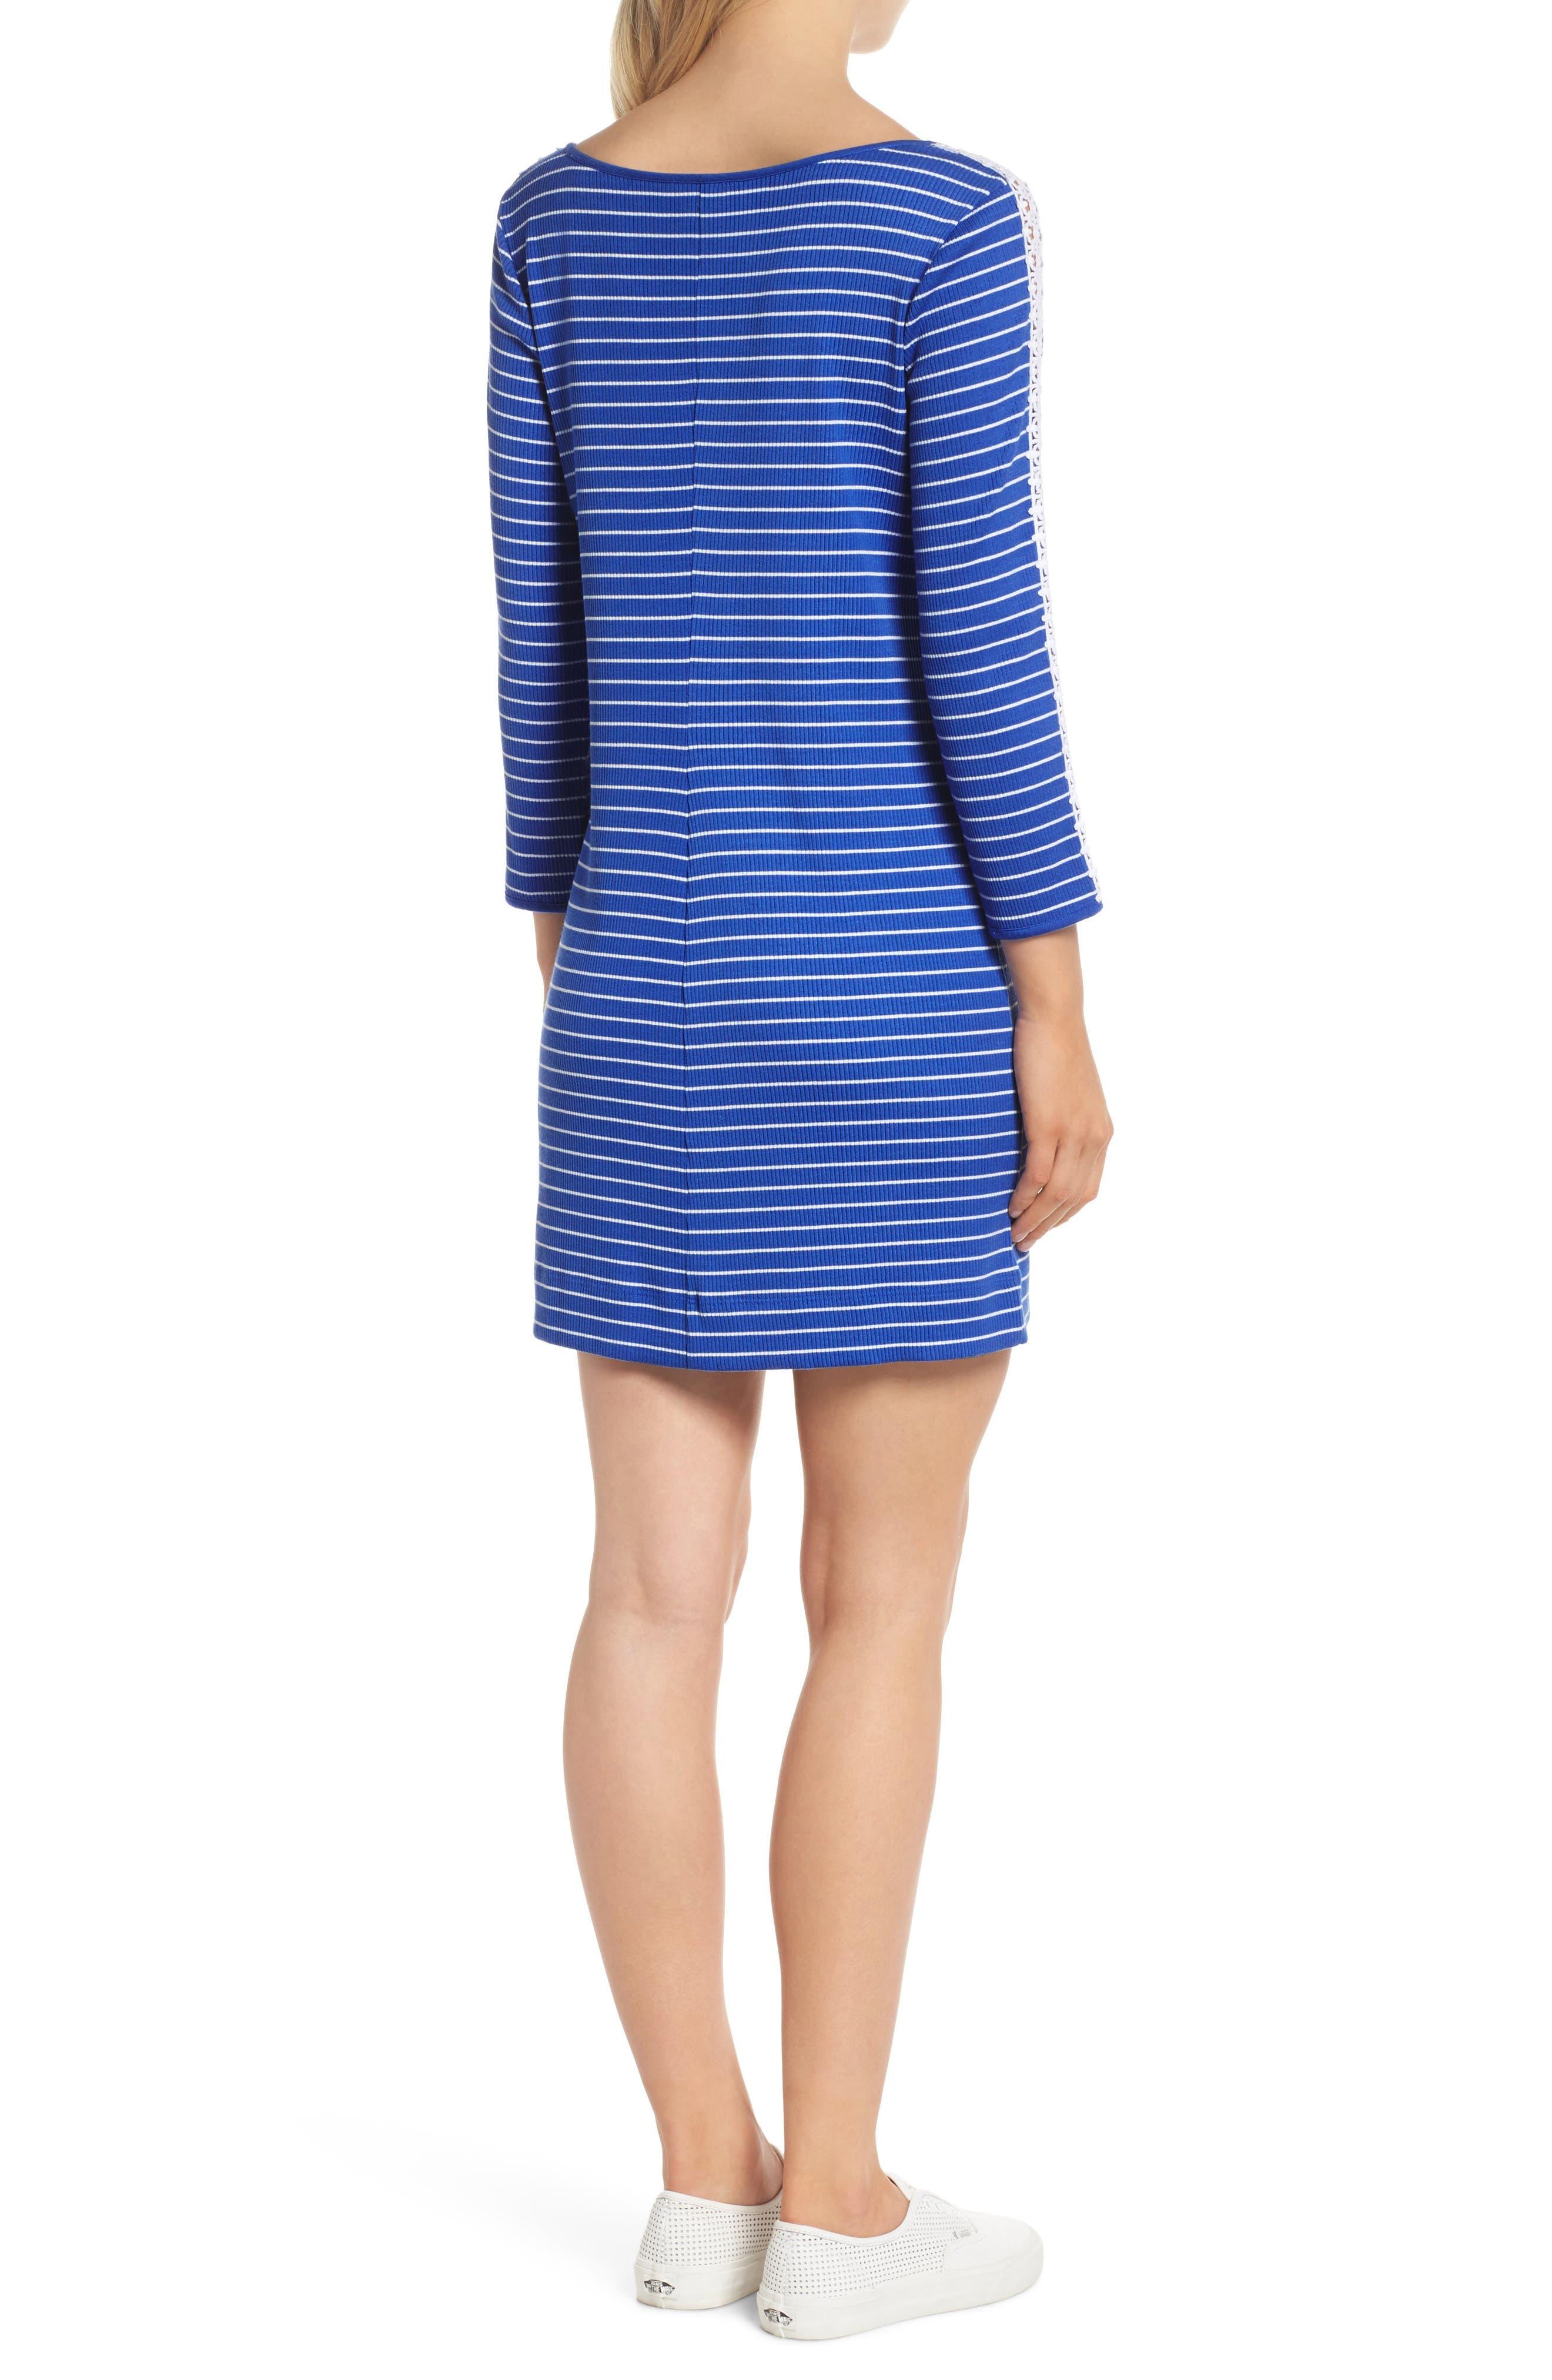 Marlowe Shift Dress,                             Alternate thumbnail 2, color,                             Beckon Blue Breeze Stripe